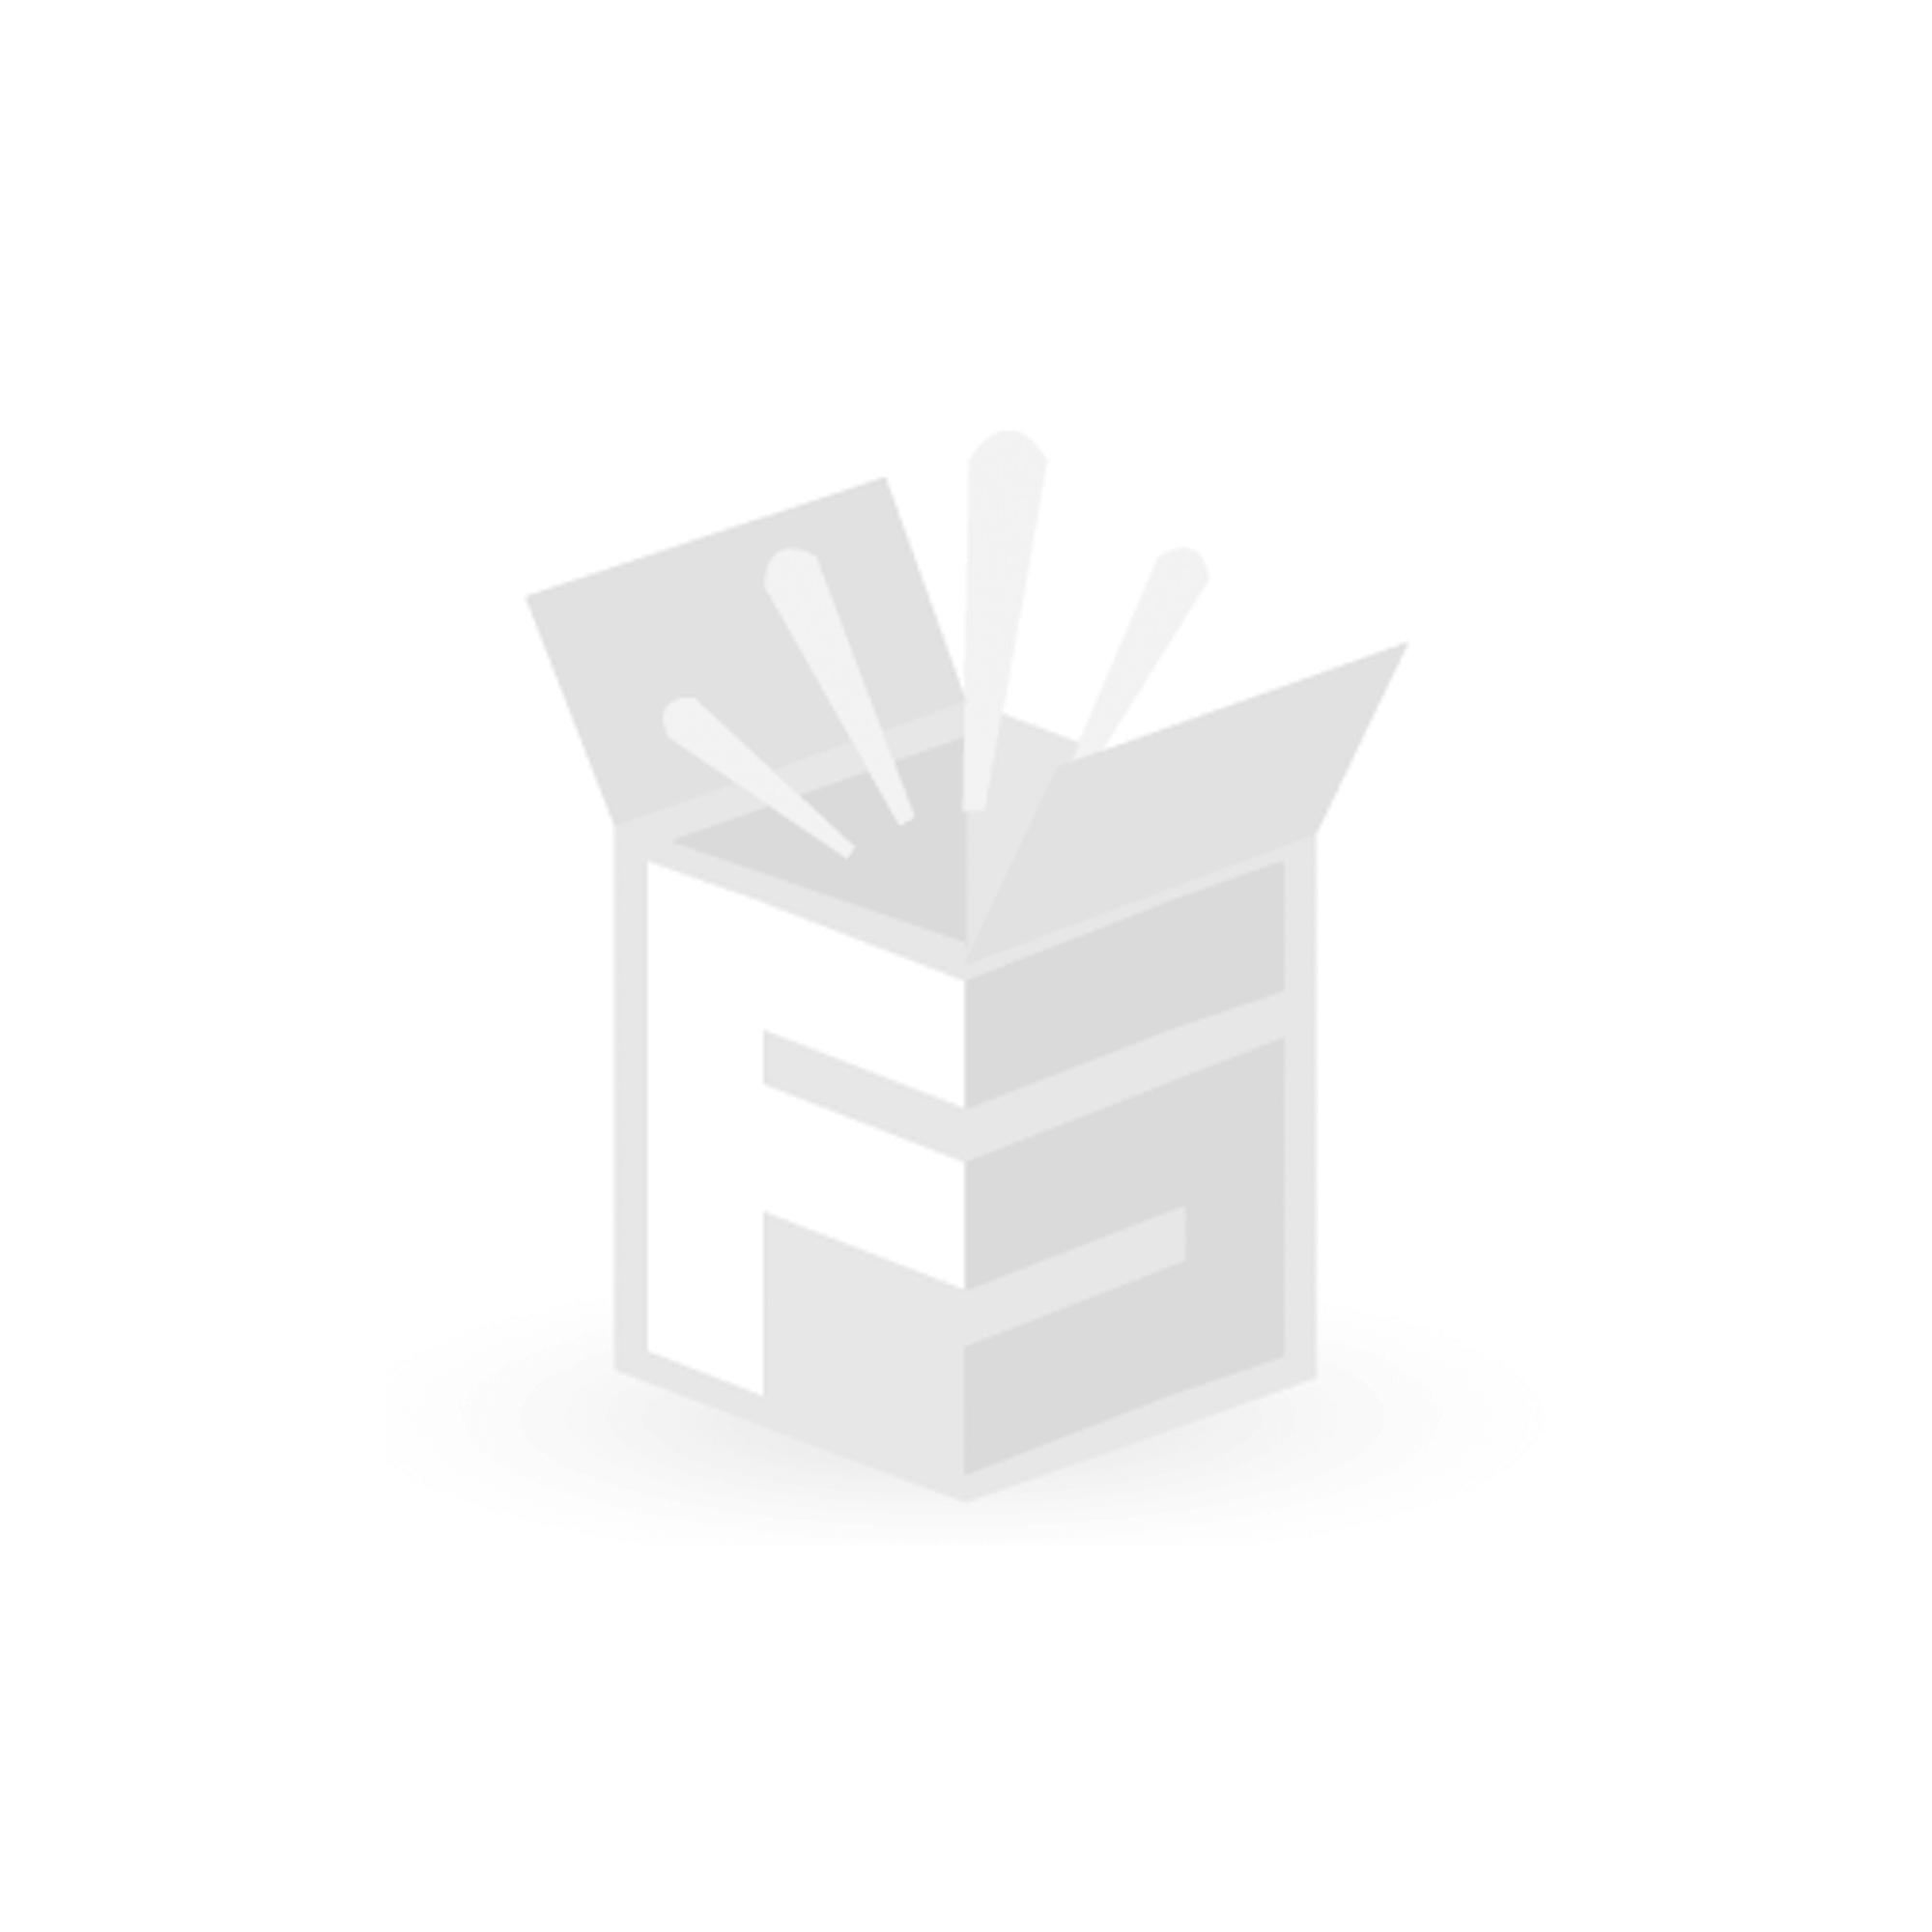 Kibernetik Sockel zu Briefkasten Swiss Norm, Metall